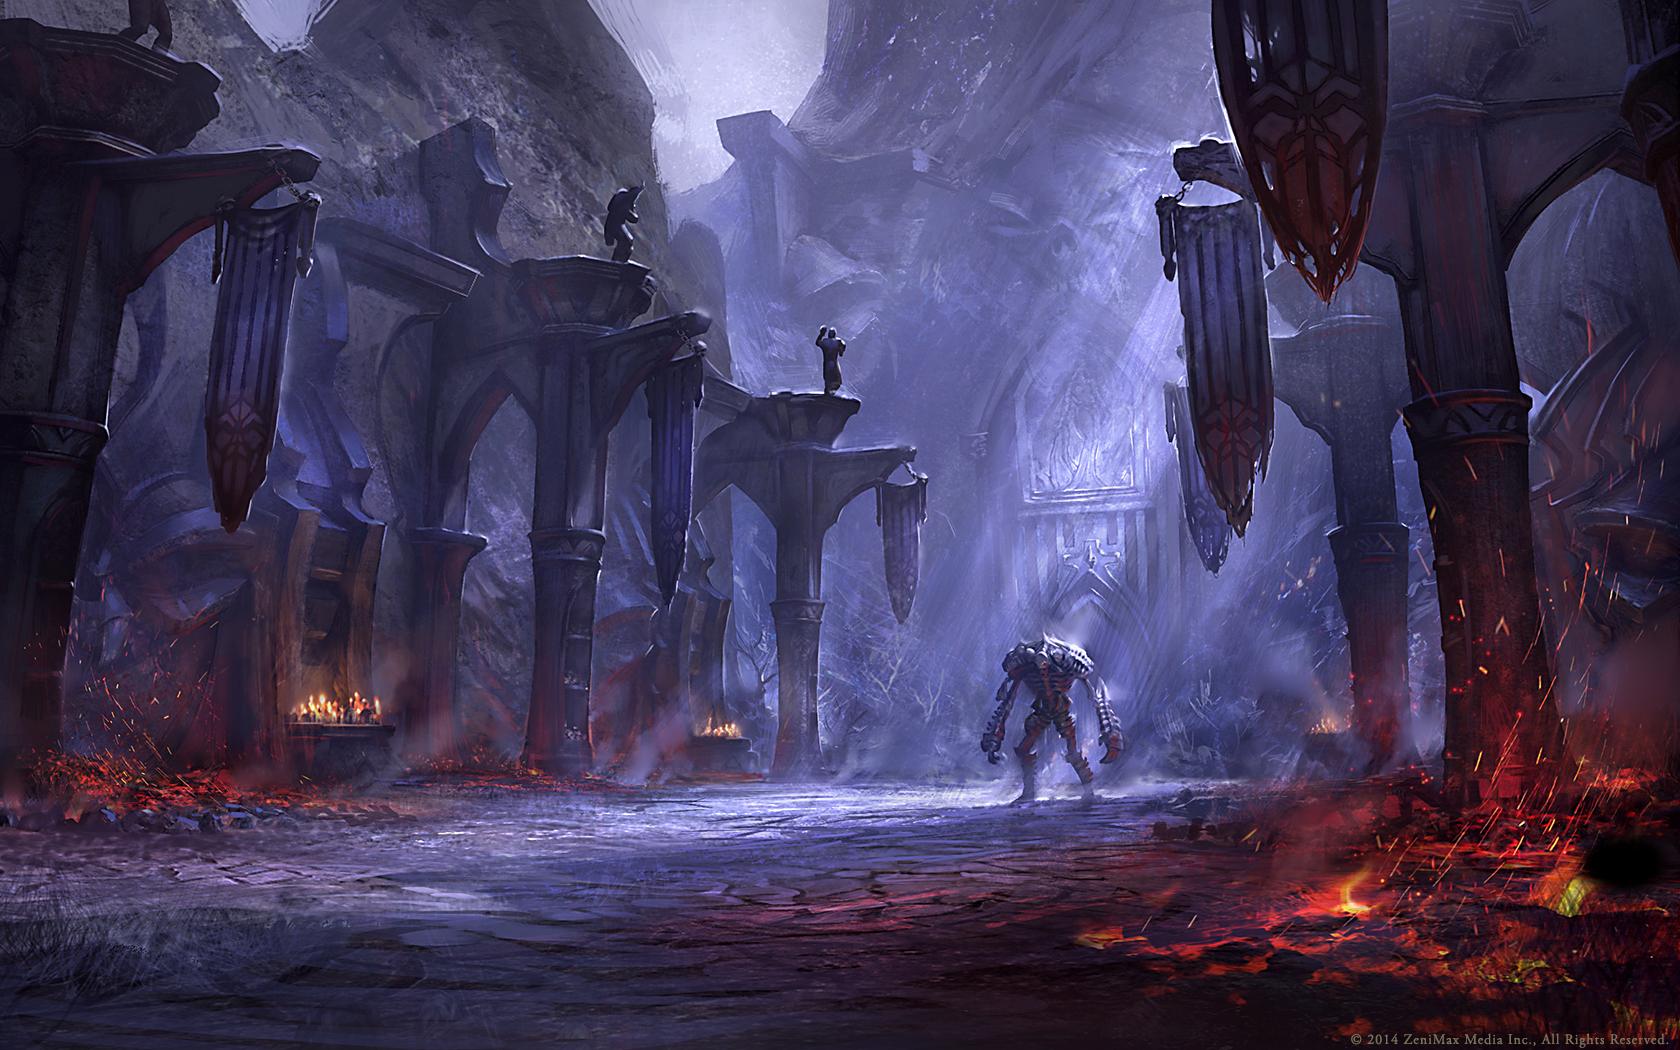 Krásné artworky z Elder Scrolls Online 94972